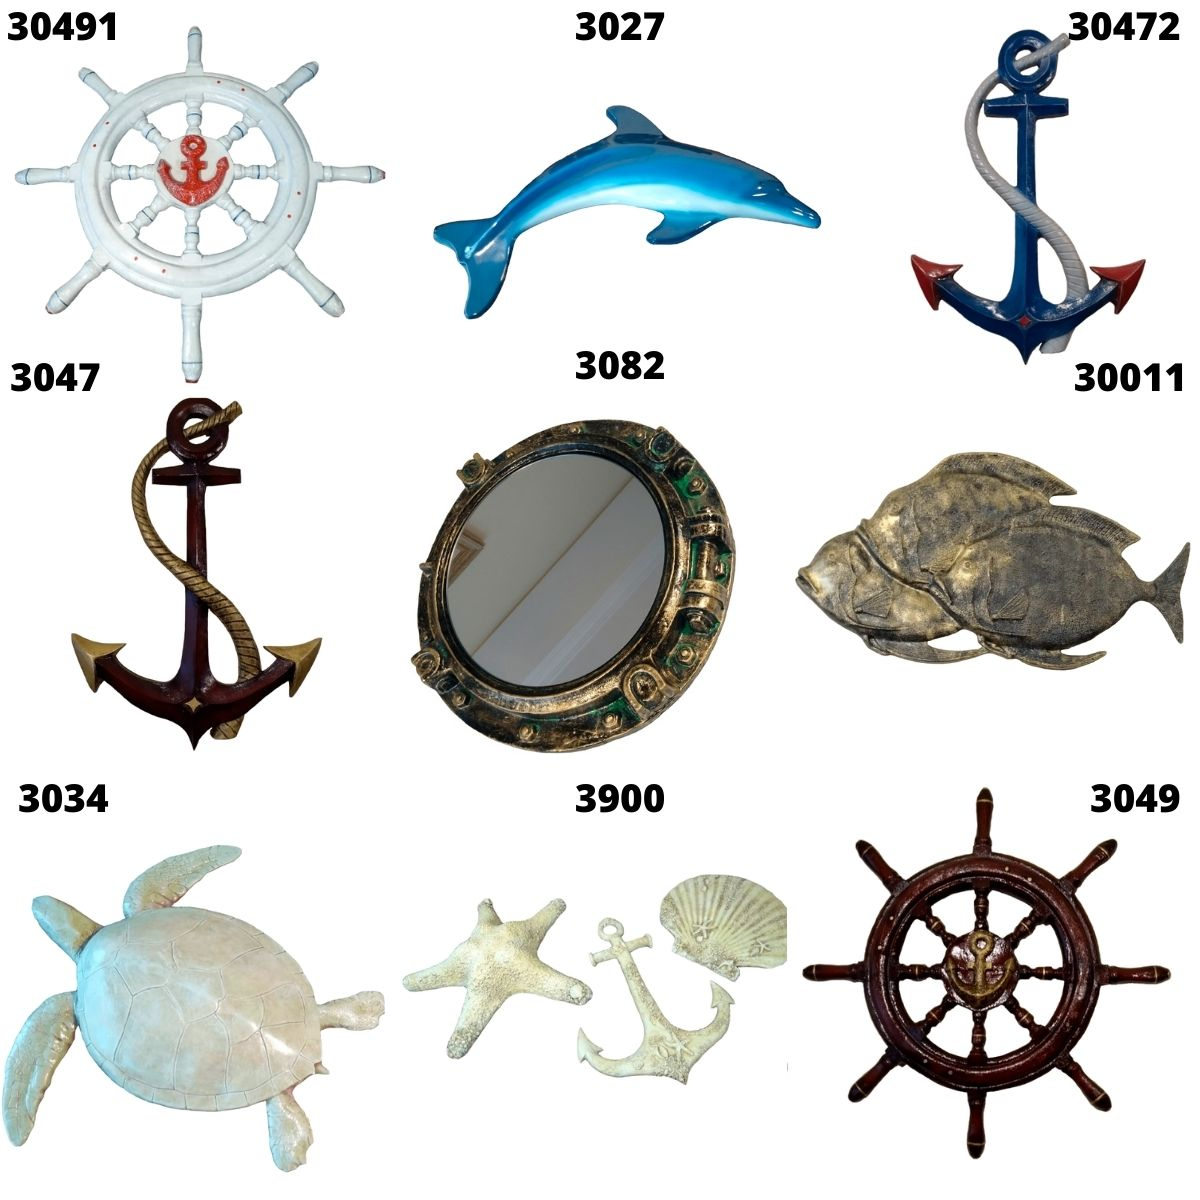 Concha Marinha Decorativa Enfeite Parede Praia Resina 11x10